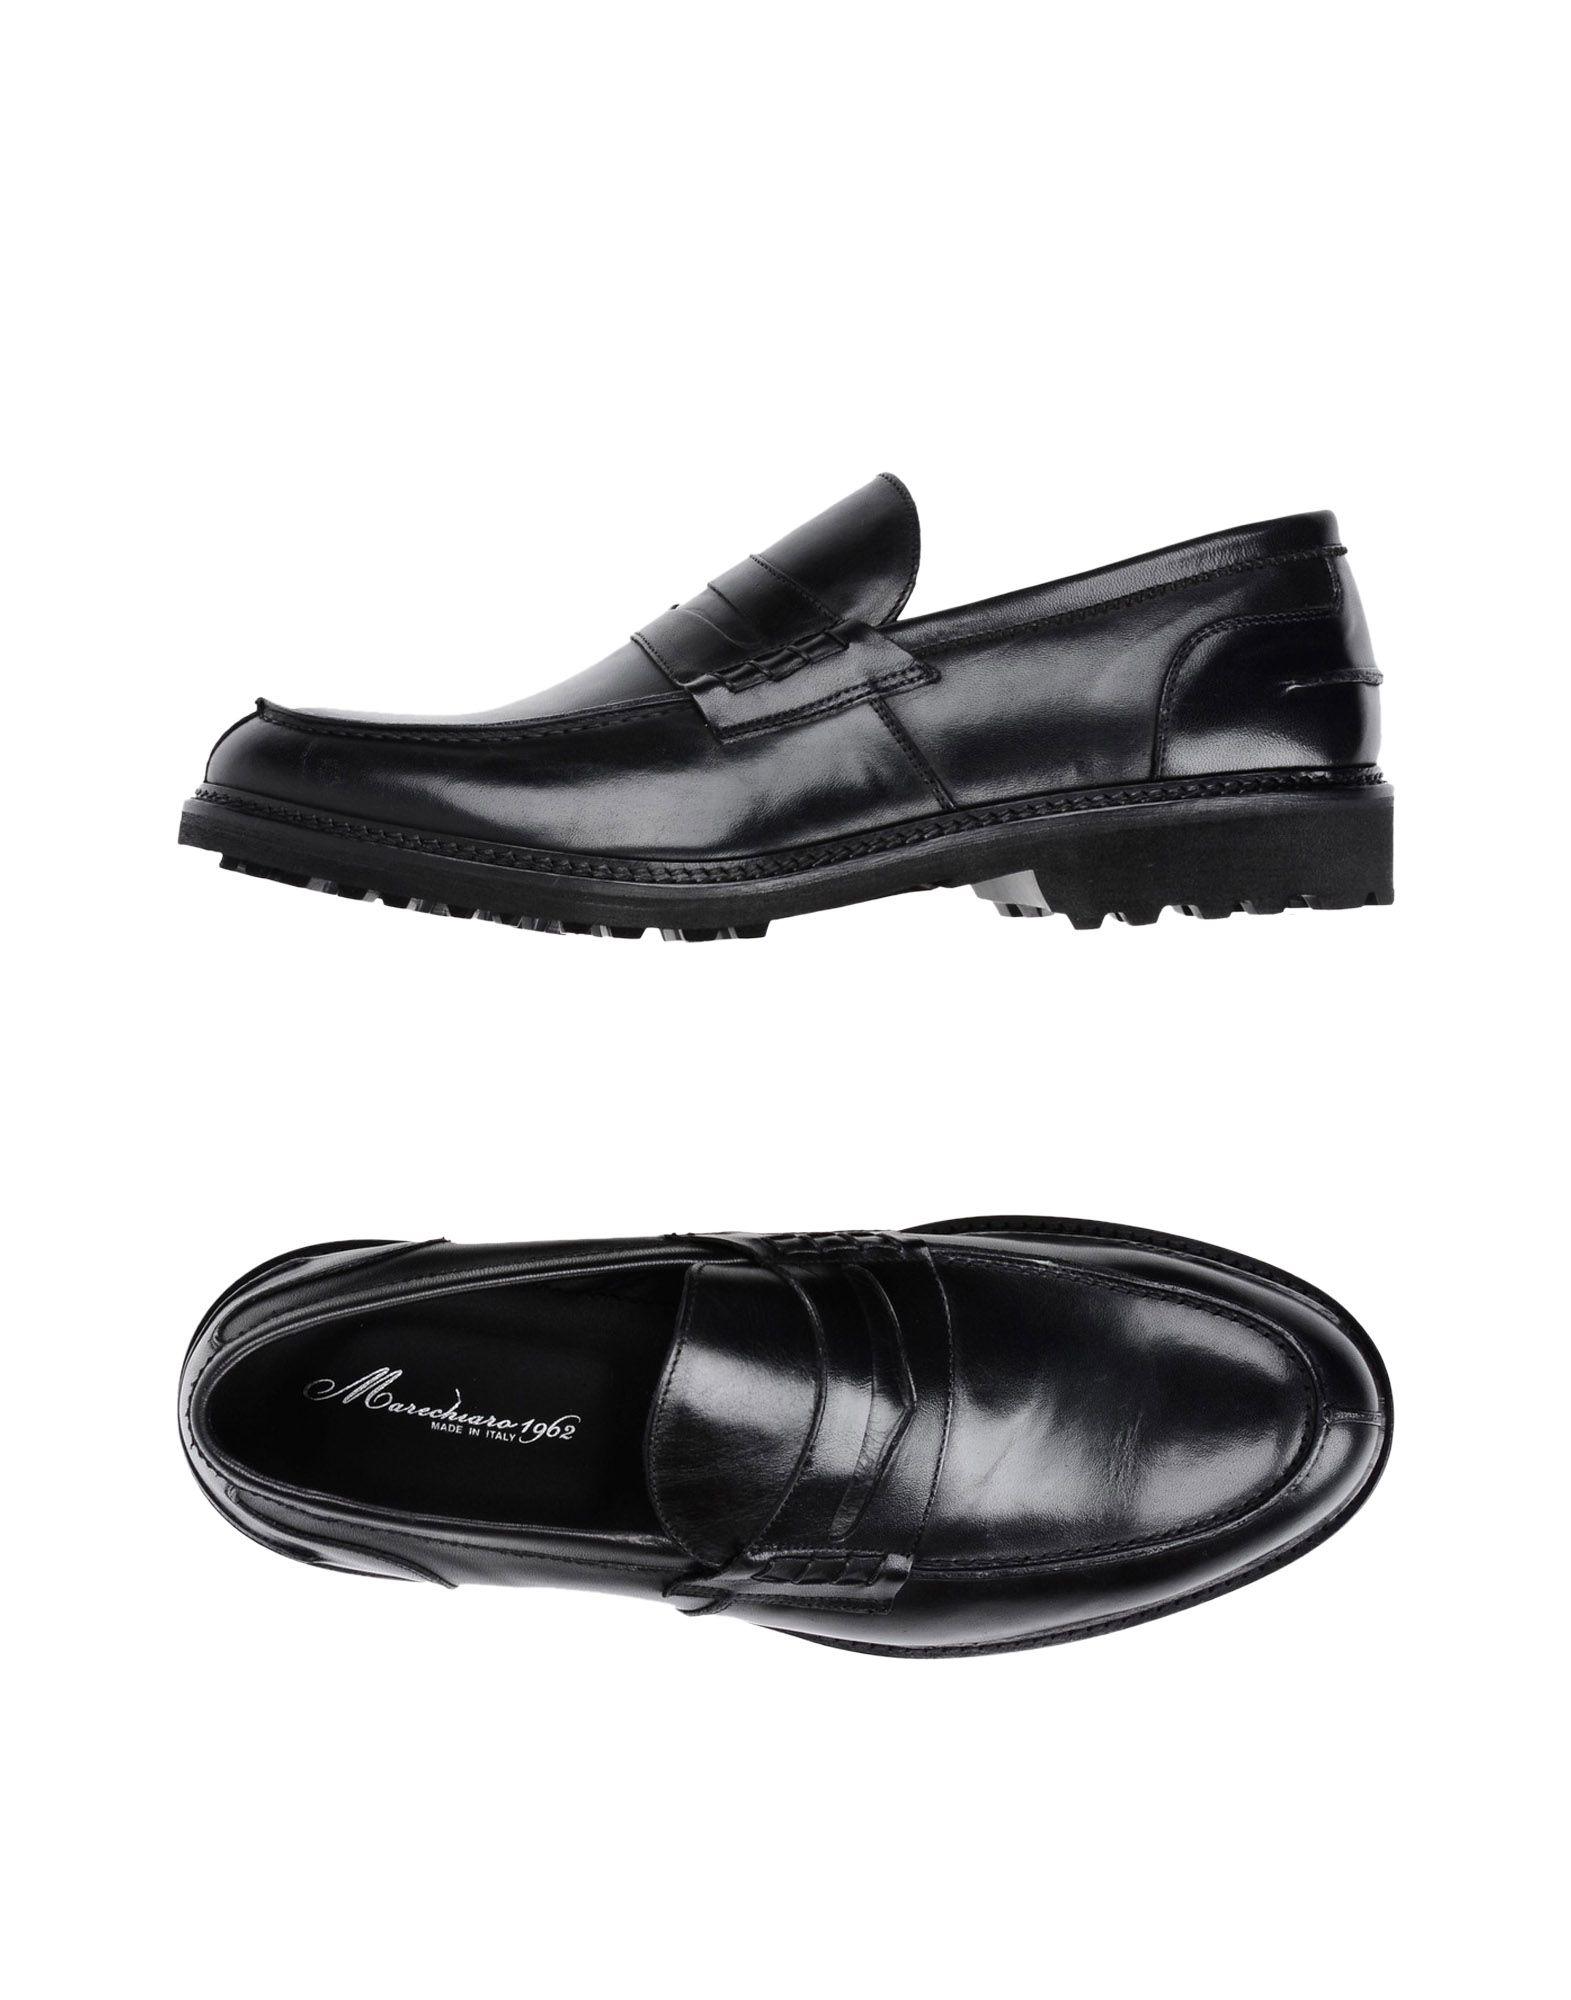 Marechiaro 1962 Mokassins Herren  11331078VU Gute Qualität beliebte Schuhe